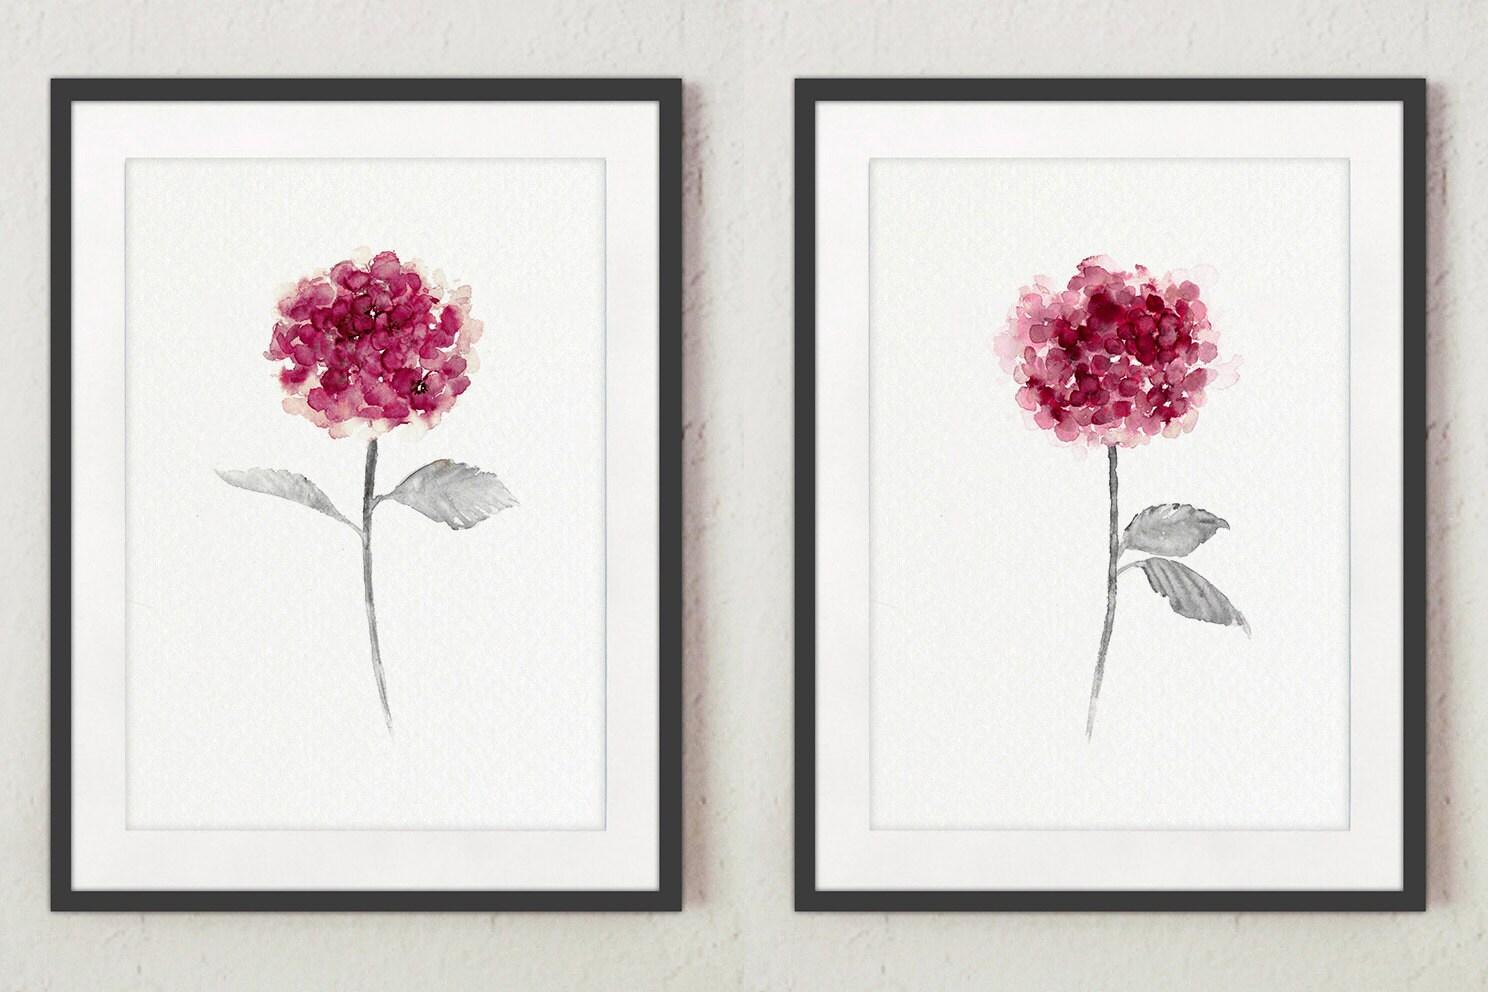 Pink hydrangea set 2 shabby chic decor minimalist for Minimalist gifts for housewarming